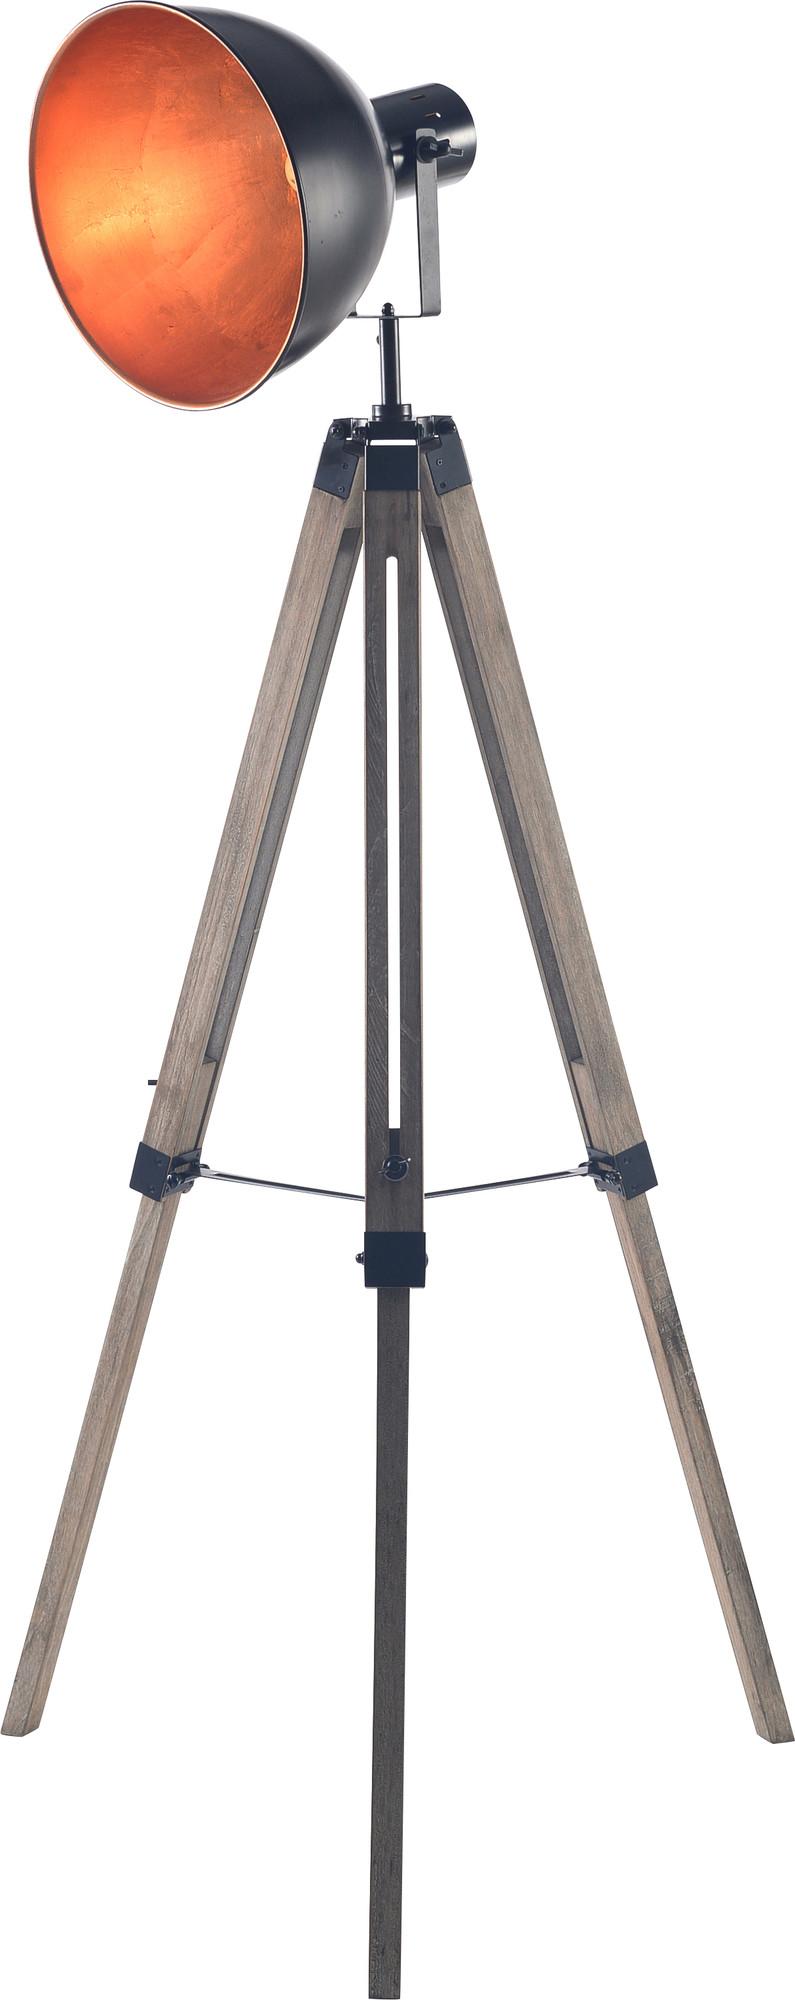 NEW-Welker-Large-Tripod-Floor-Lamp-New-Oriental-Lamps